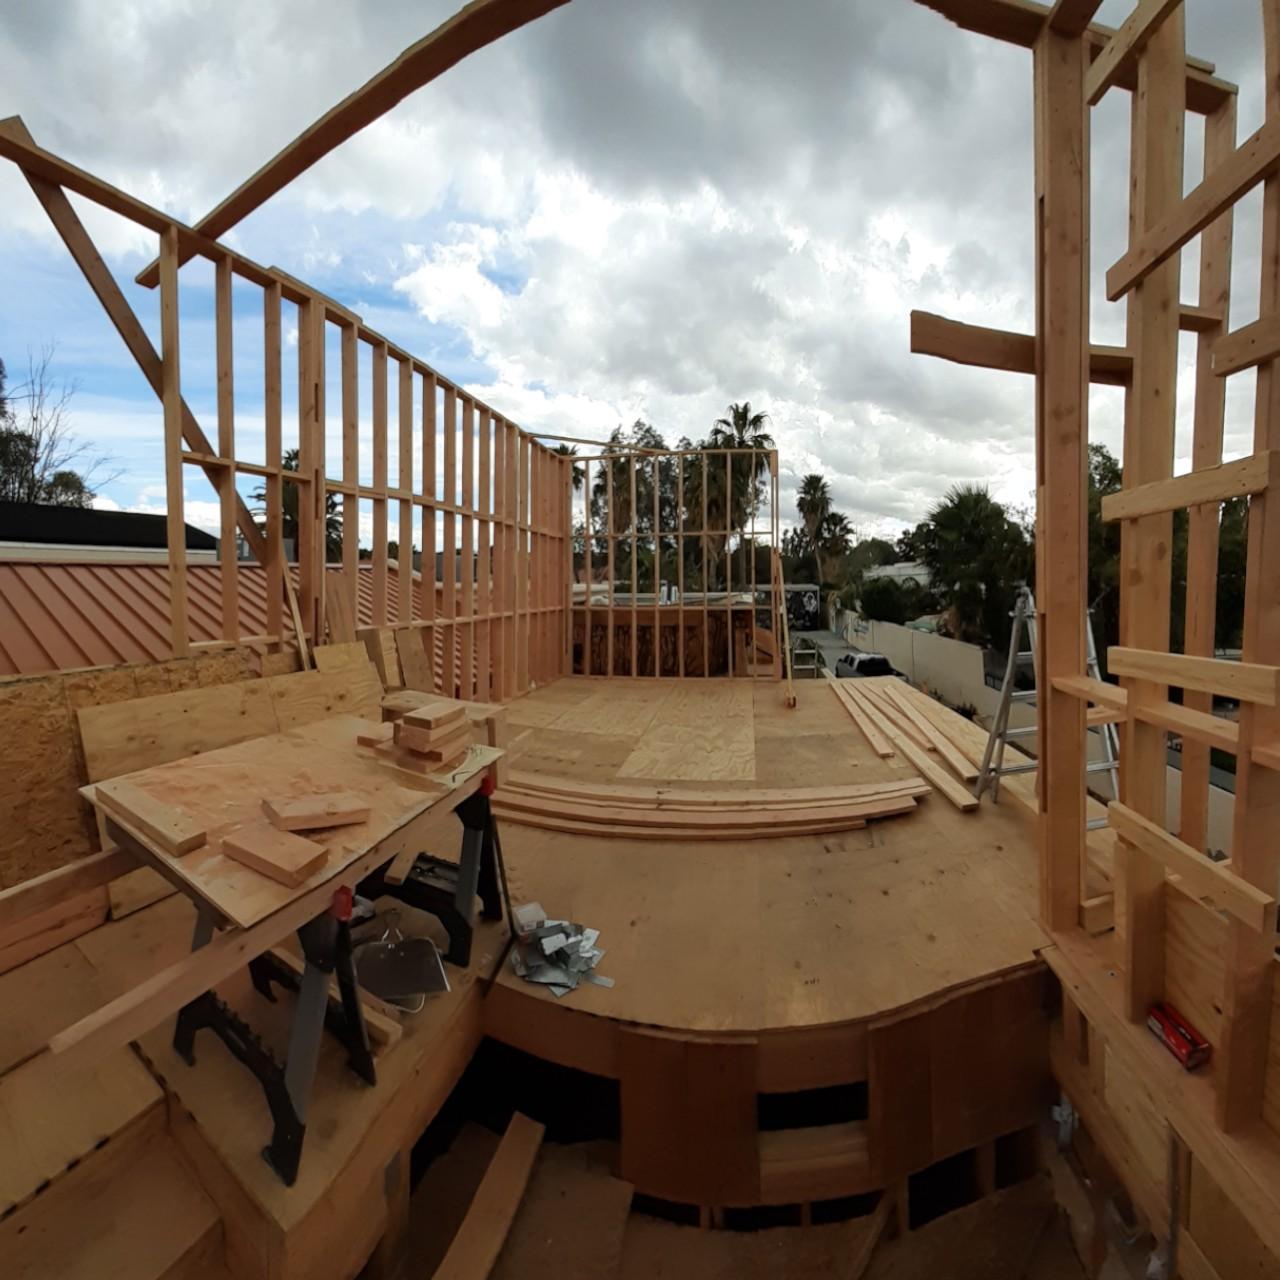 carpentry-wood-framing-second-floor-home-addition--framing-90